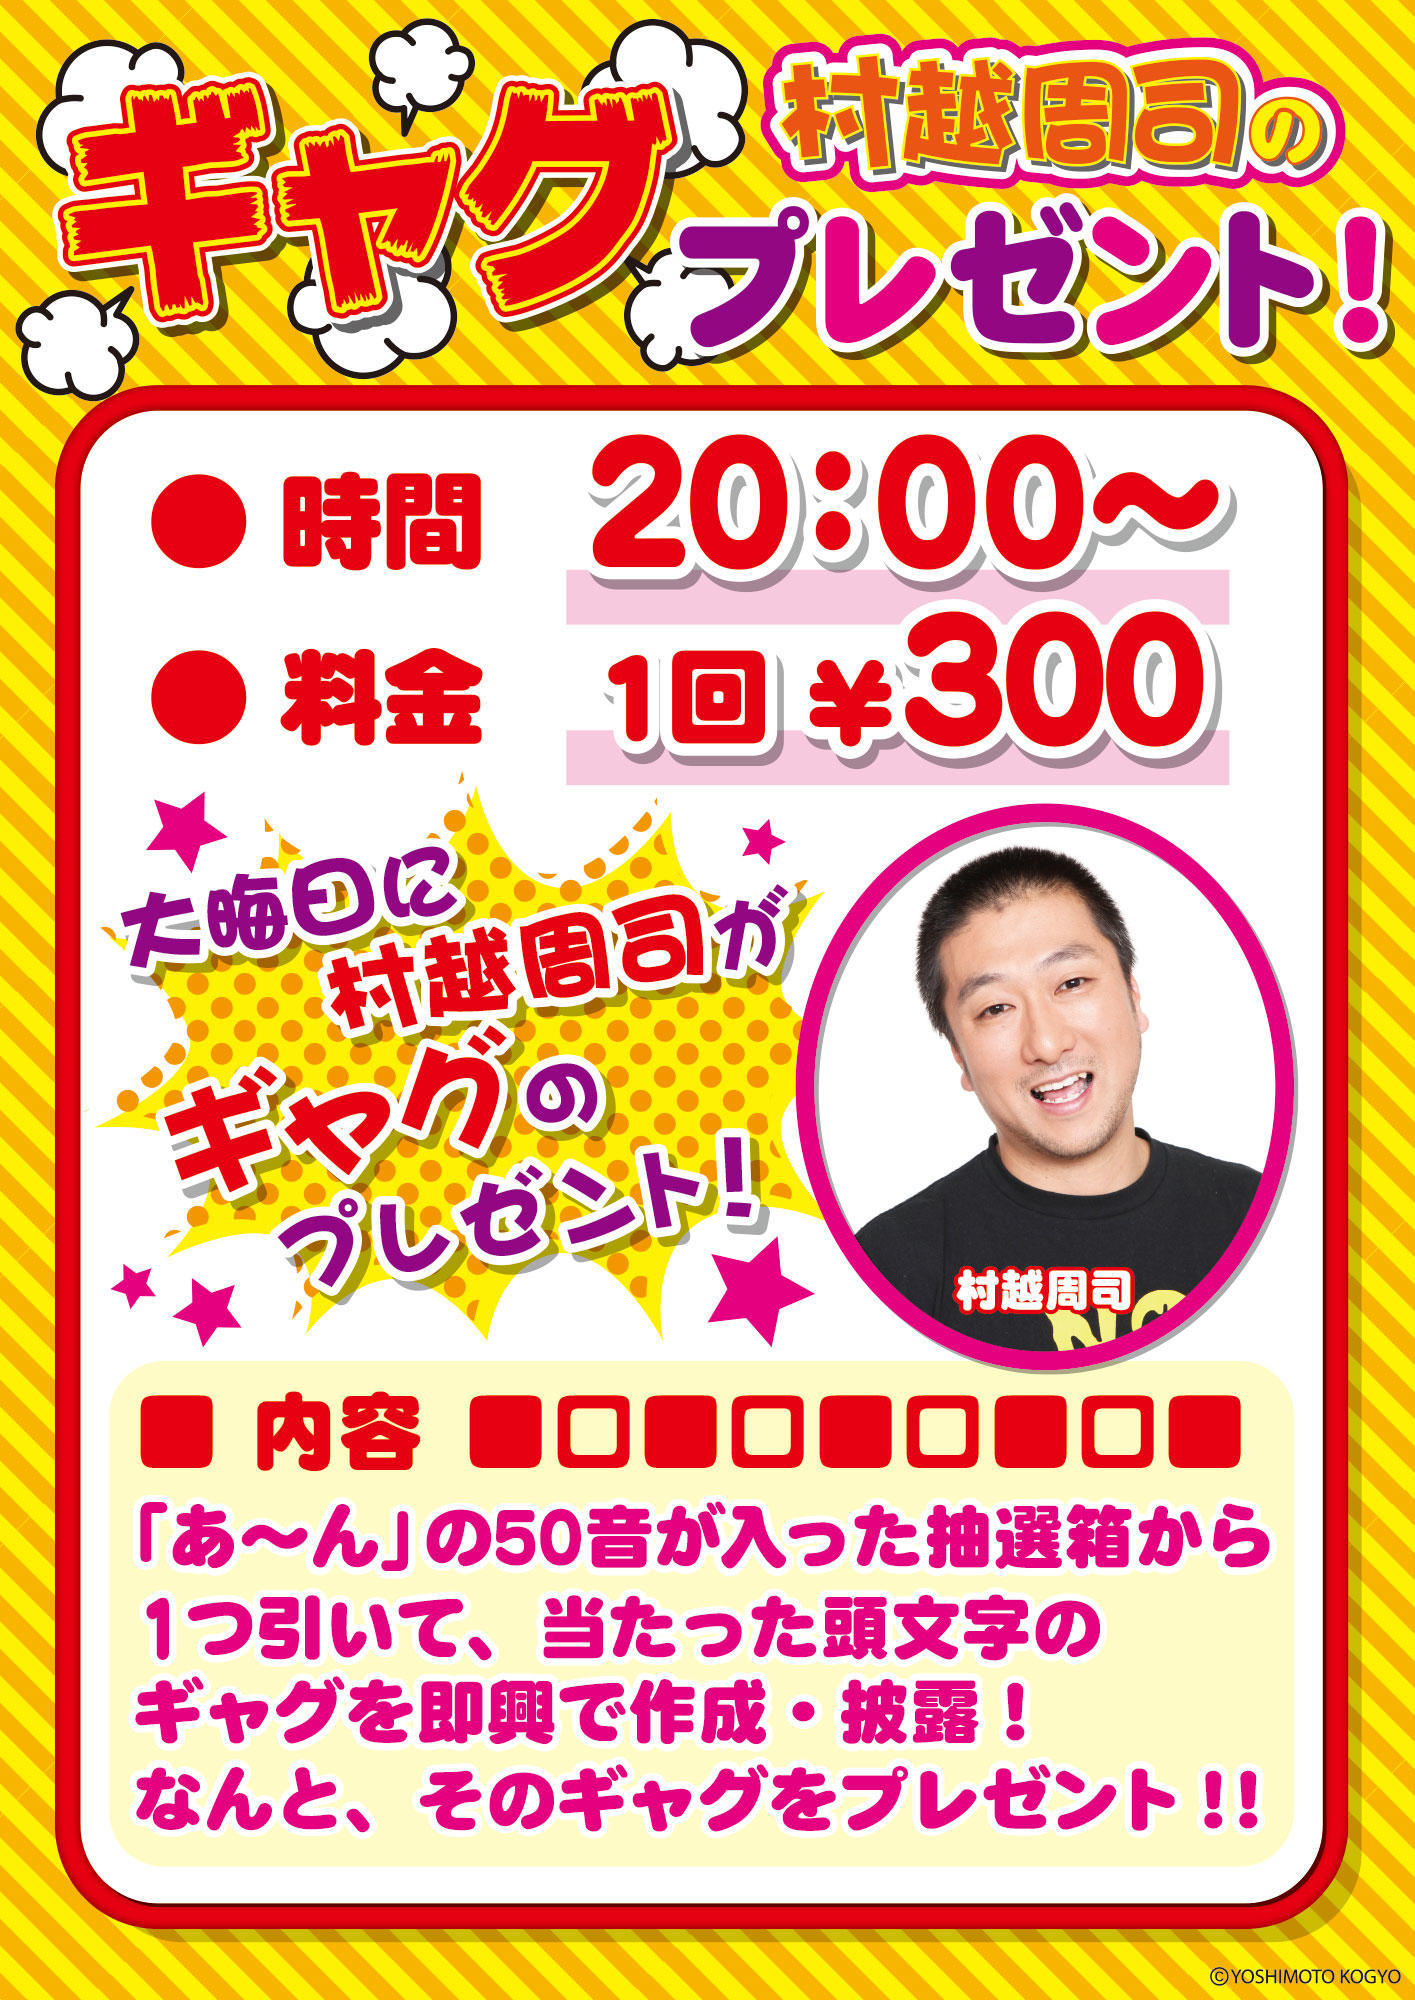 http://www.syumatsu.jp/20161230154258-e5b364407aaa47365a38b0738ba9ad232a2e671d.jpg